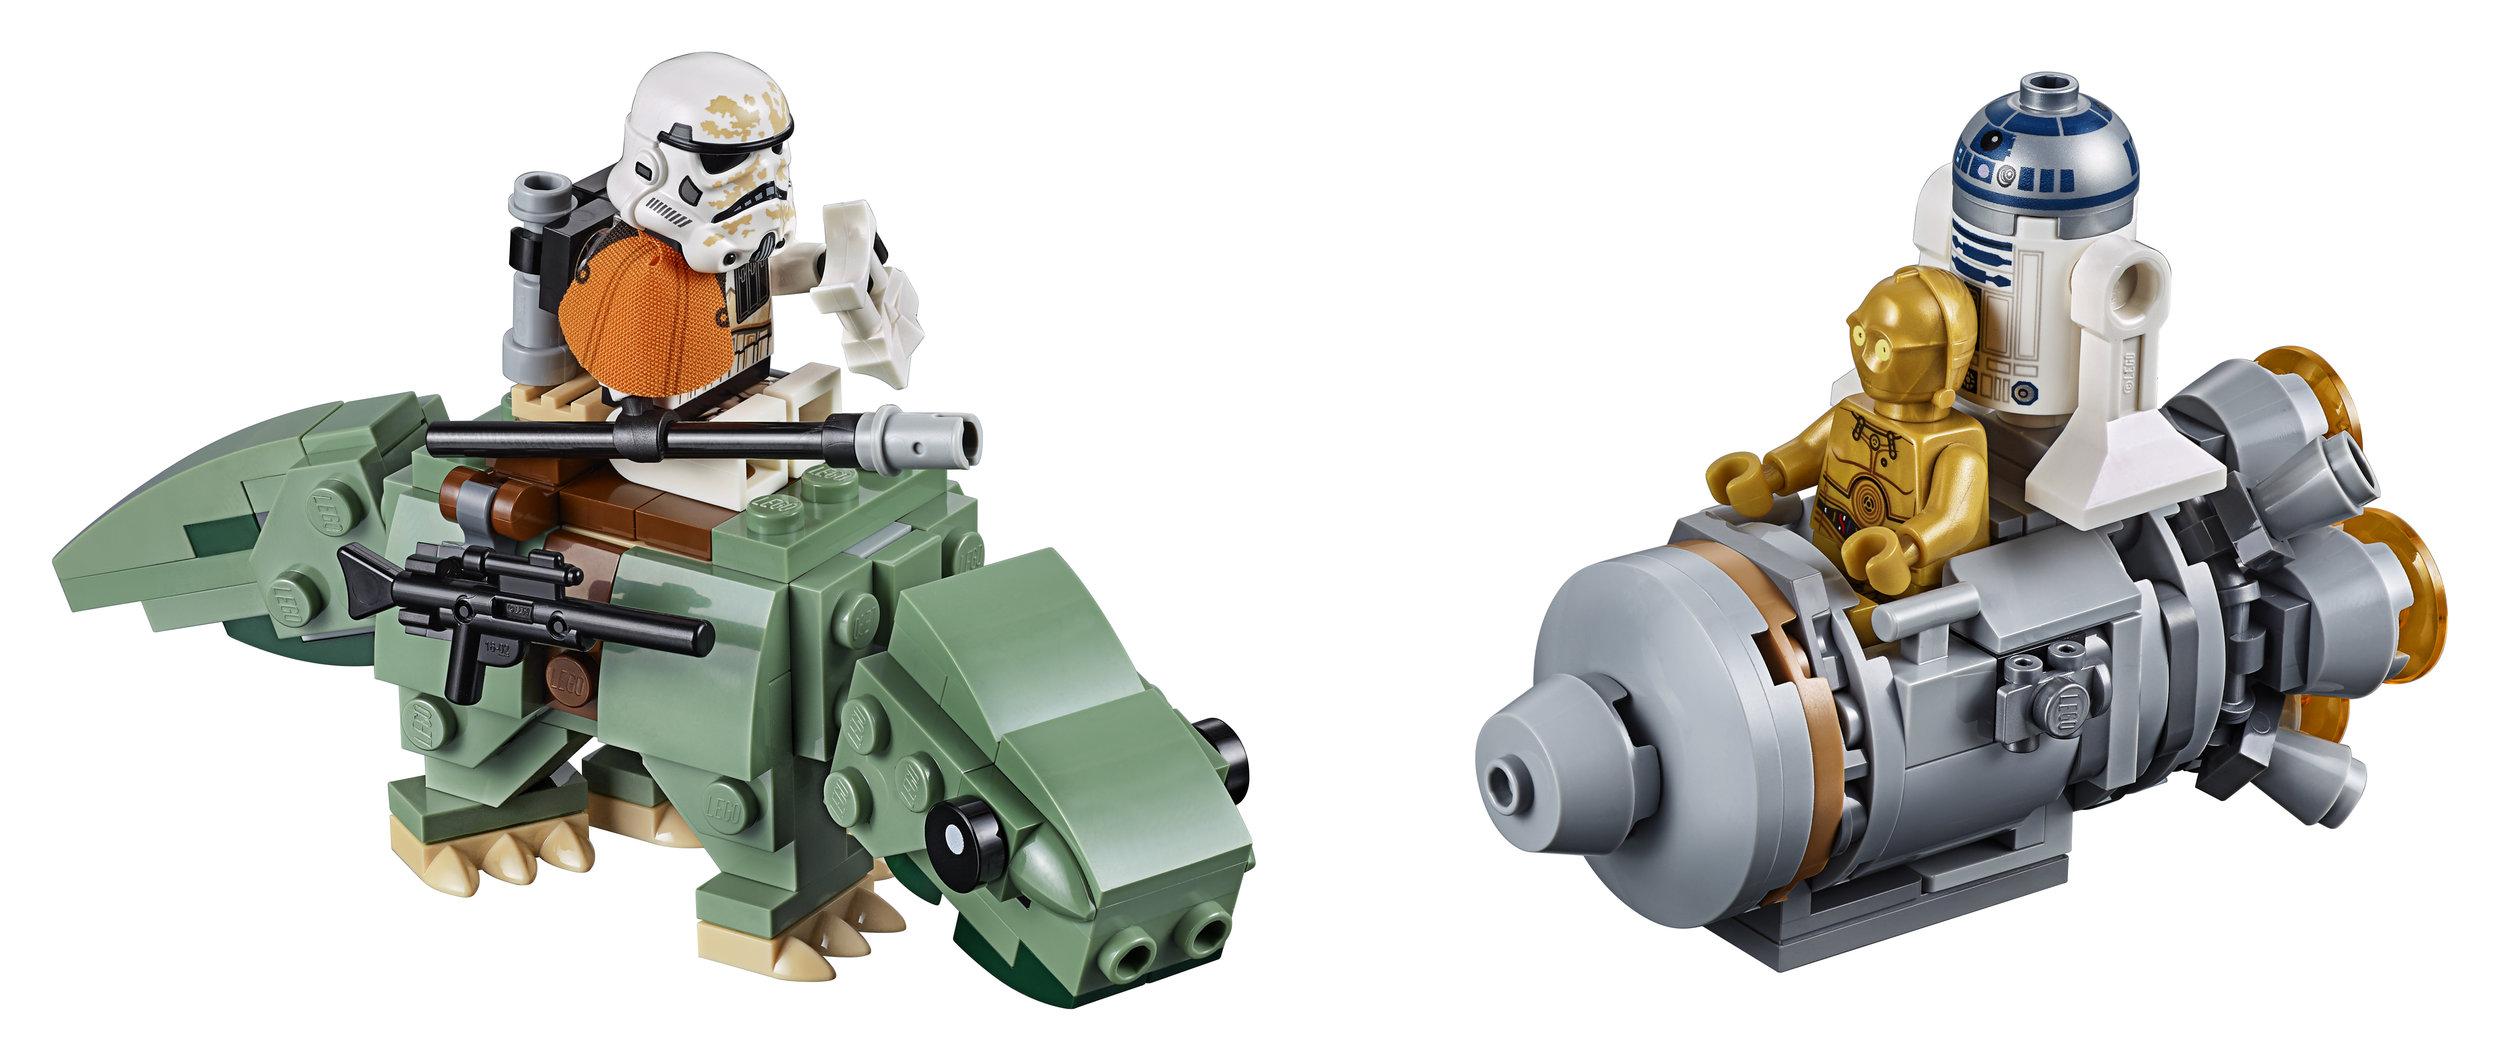 75228 Star Wars Escape Pod vs. Dewback™ Microfighters .jpg